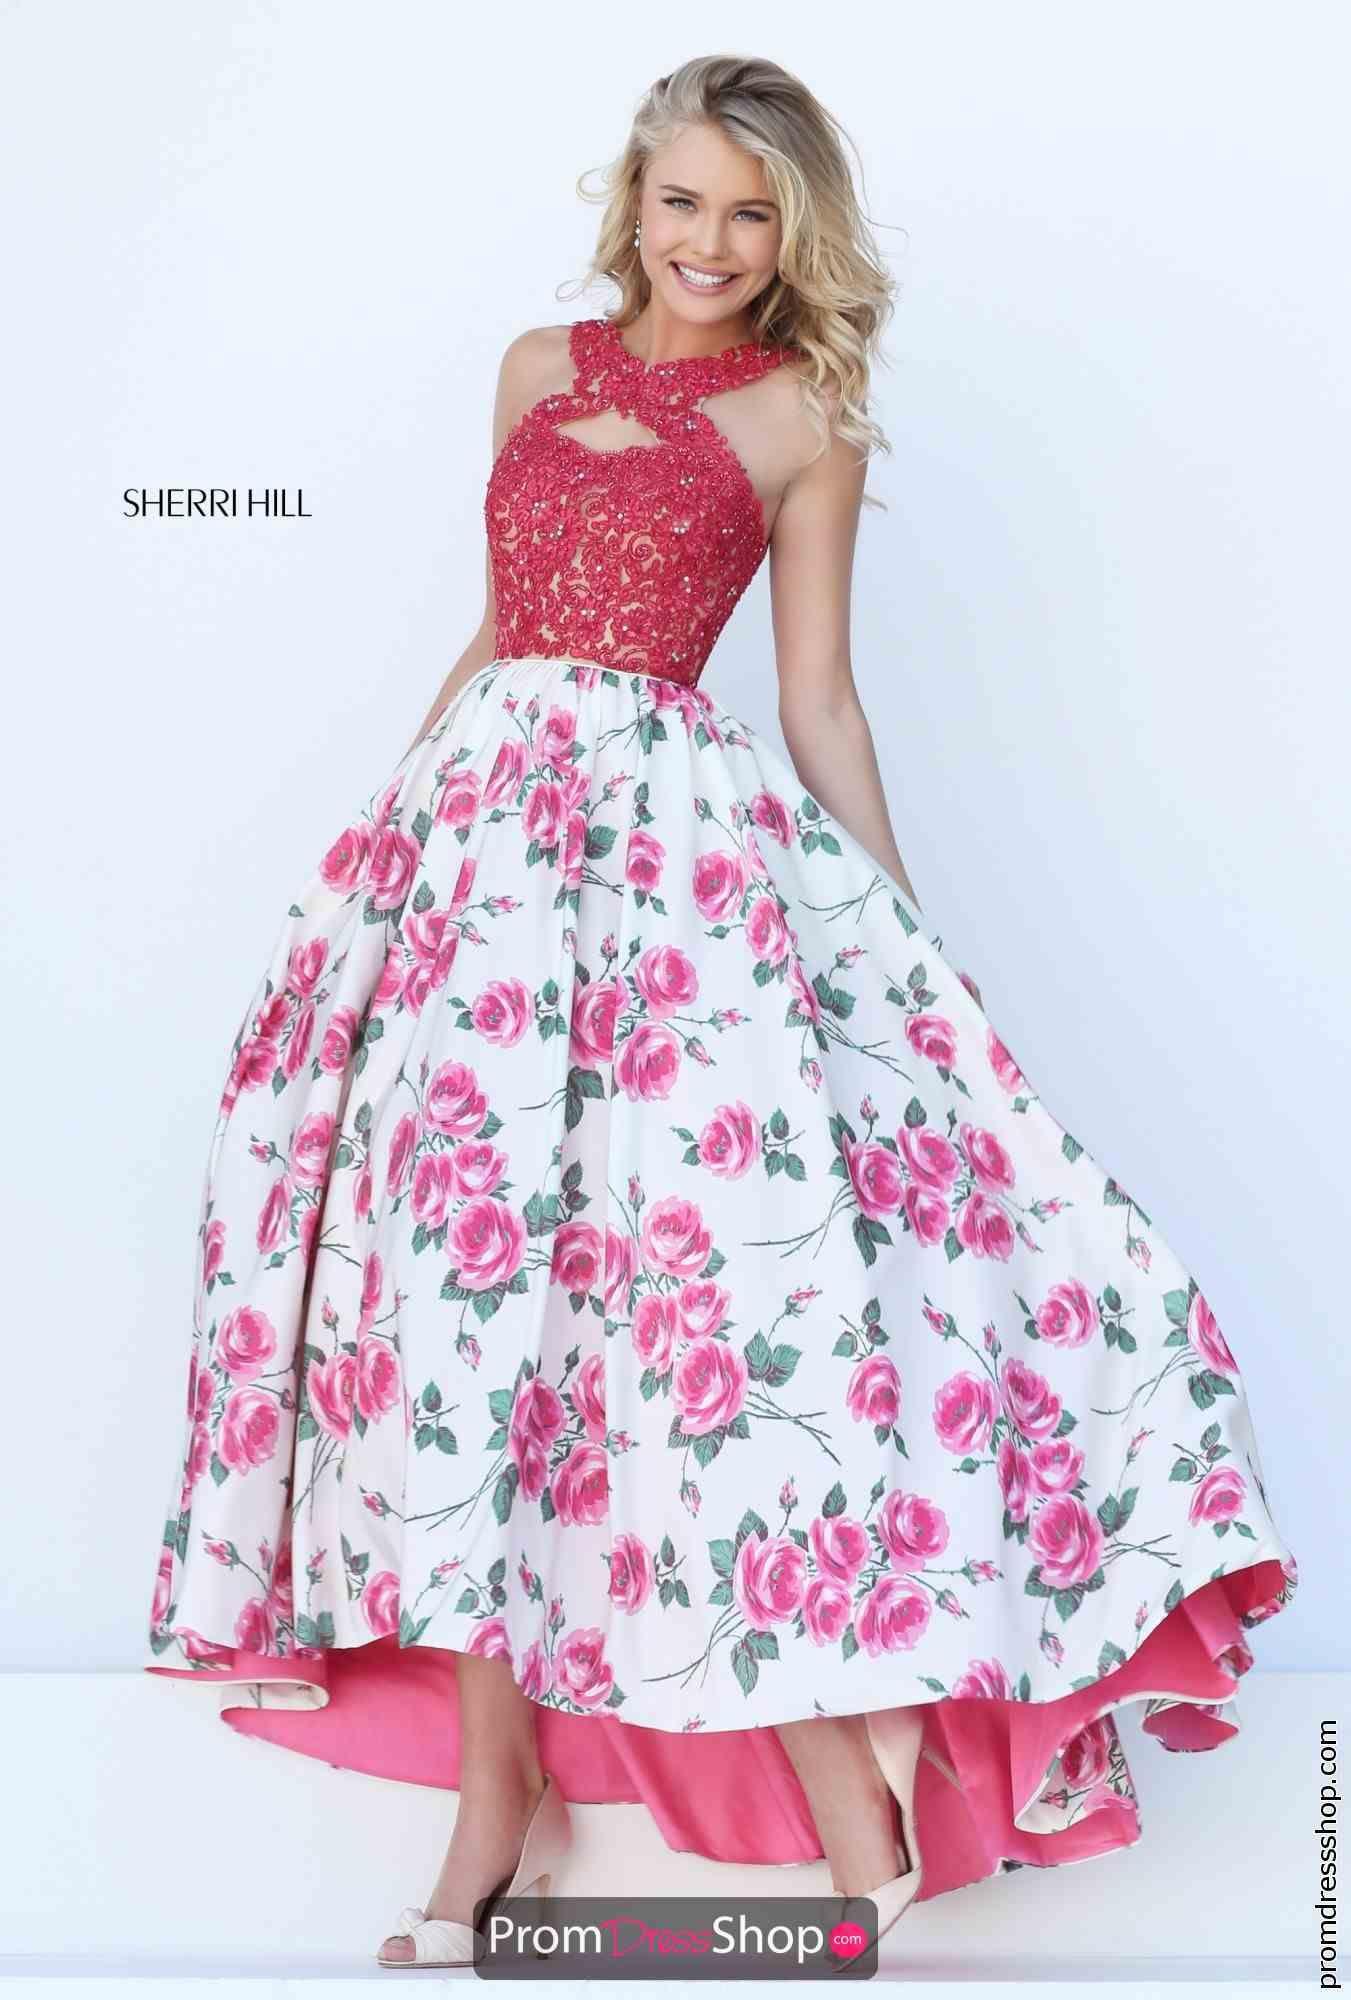 Sherri Hill Designer Dresses | Ropa bonita, Bonitas y Vestiditos